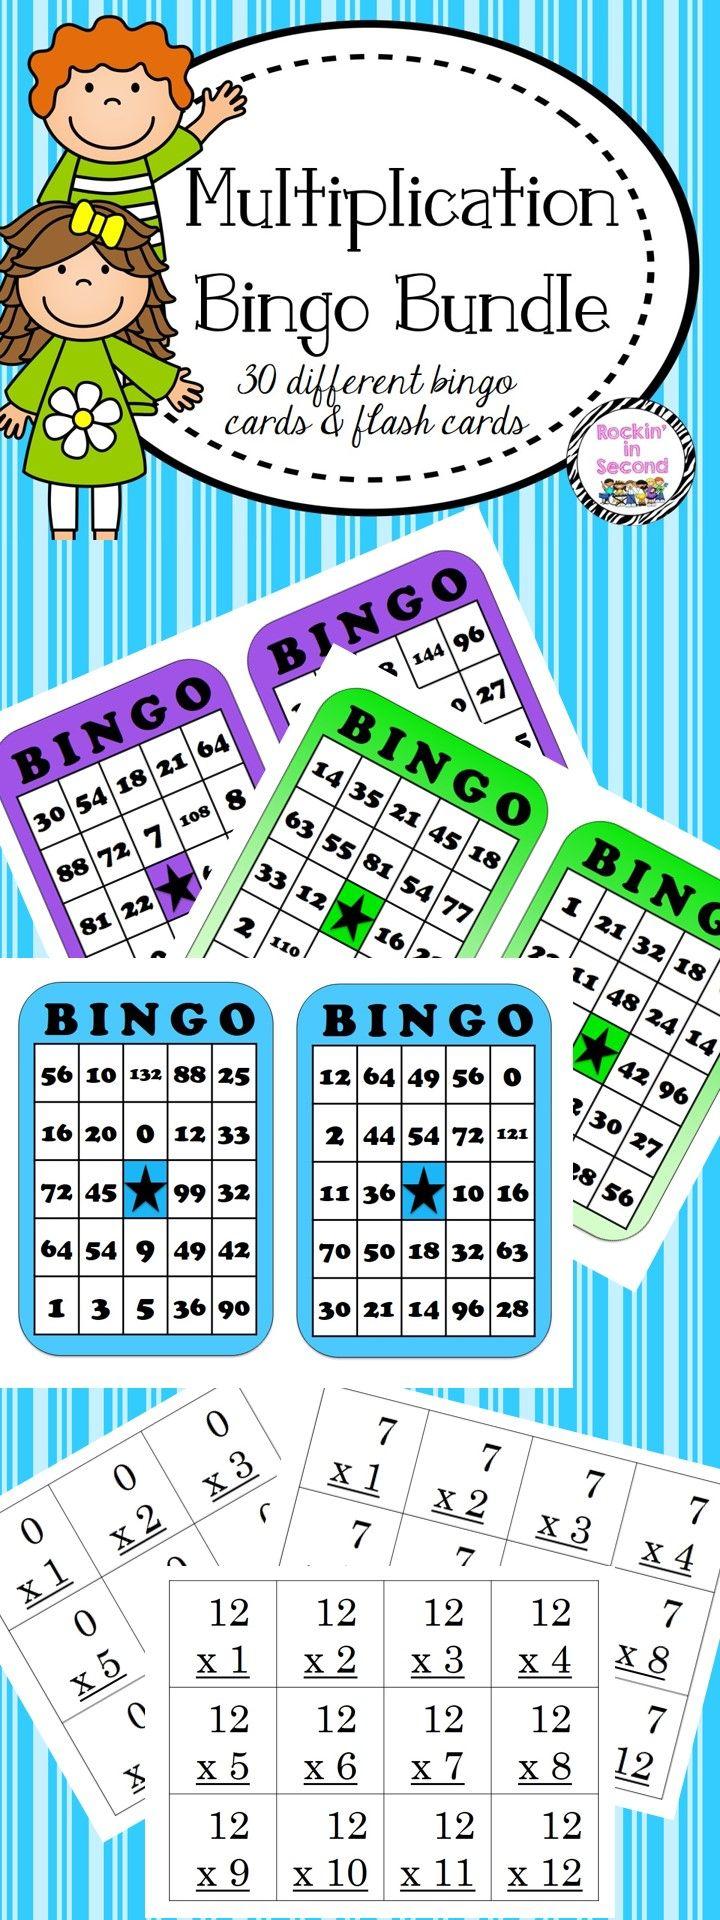 Homework bingo ideas || VIGOR-BARS.GA